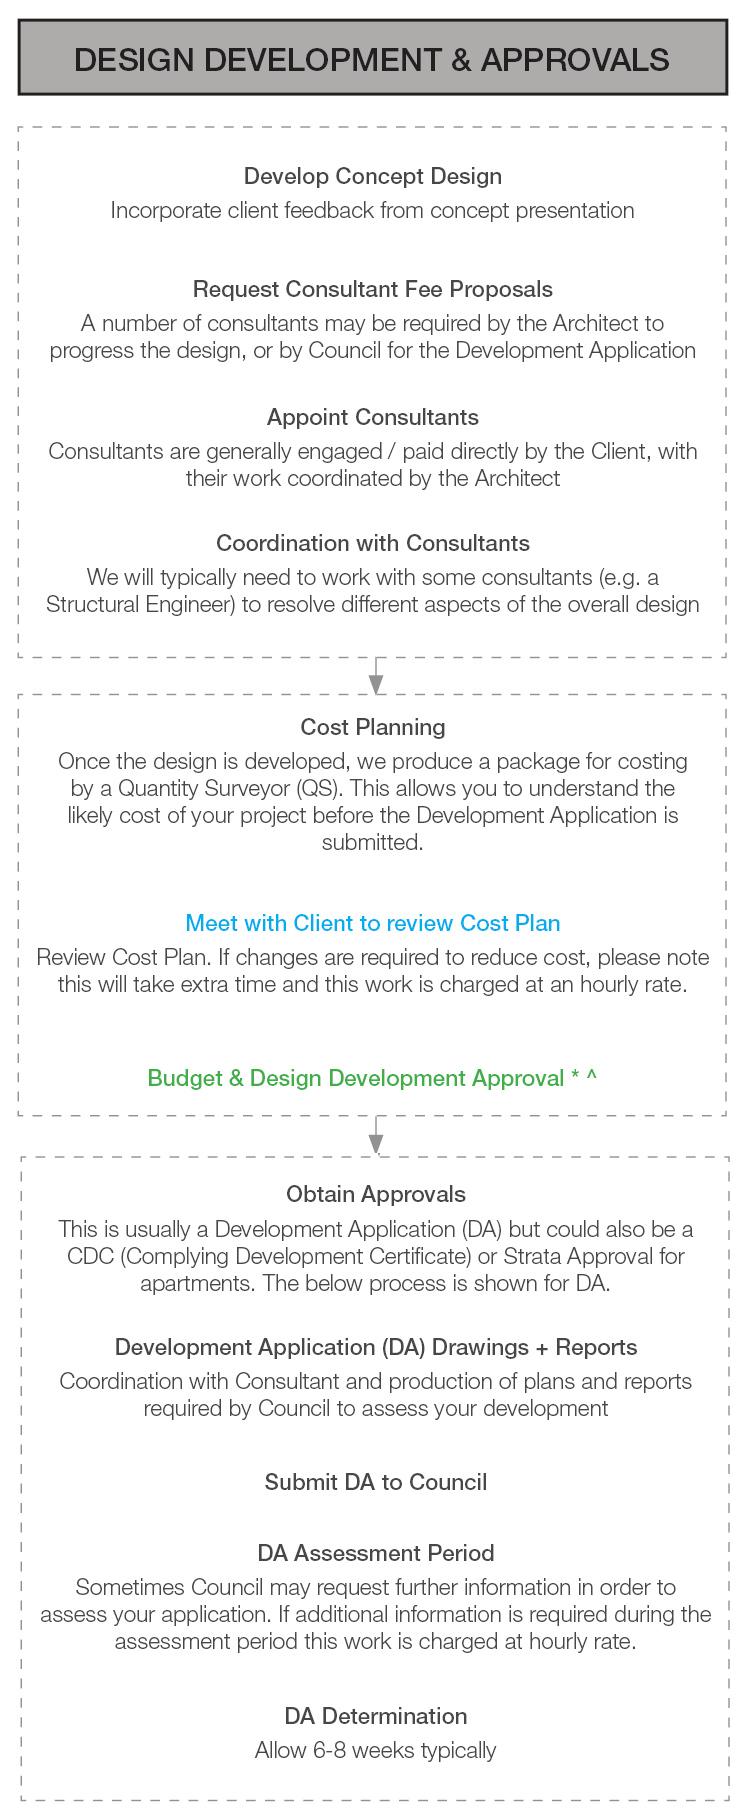 02 Design Development.jpg